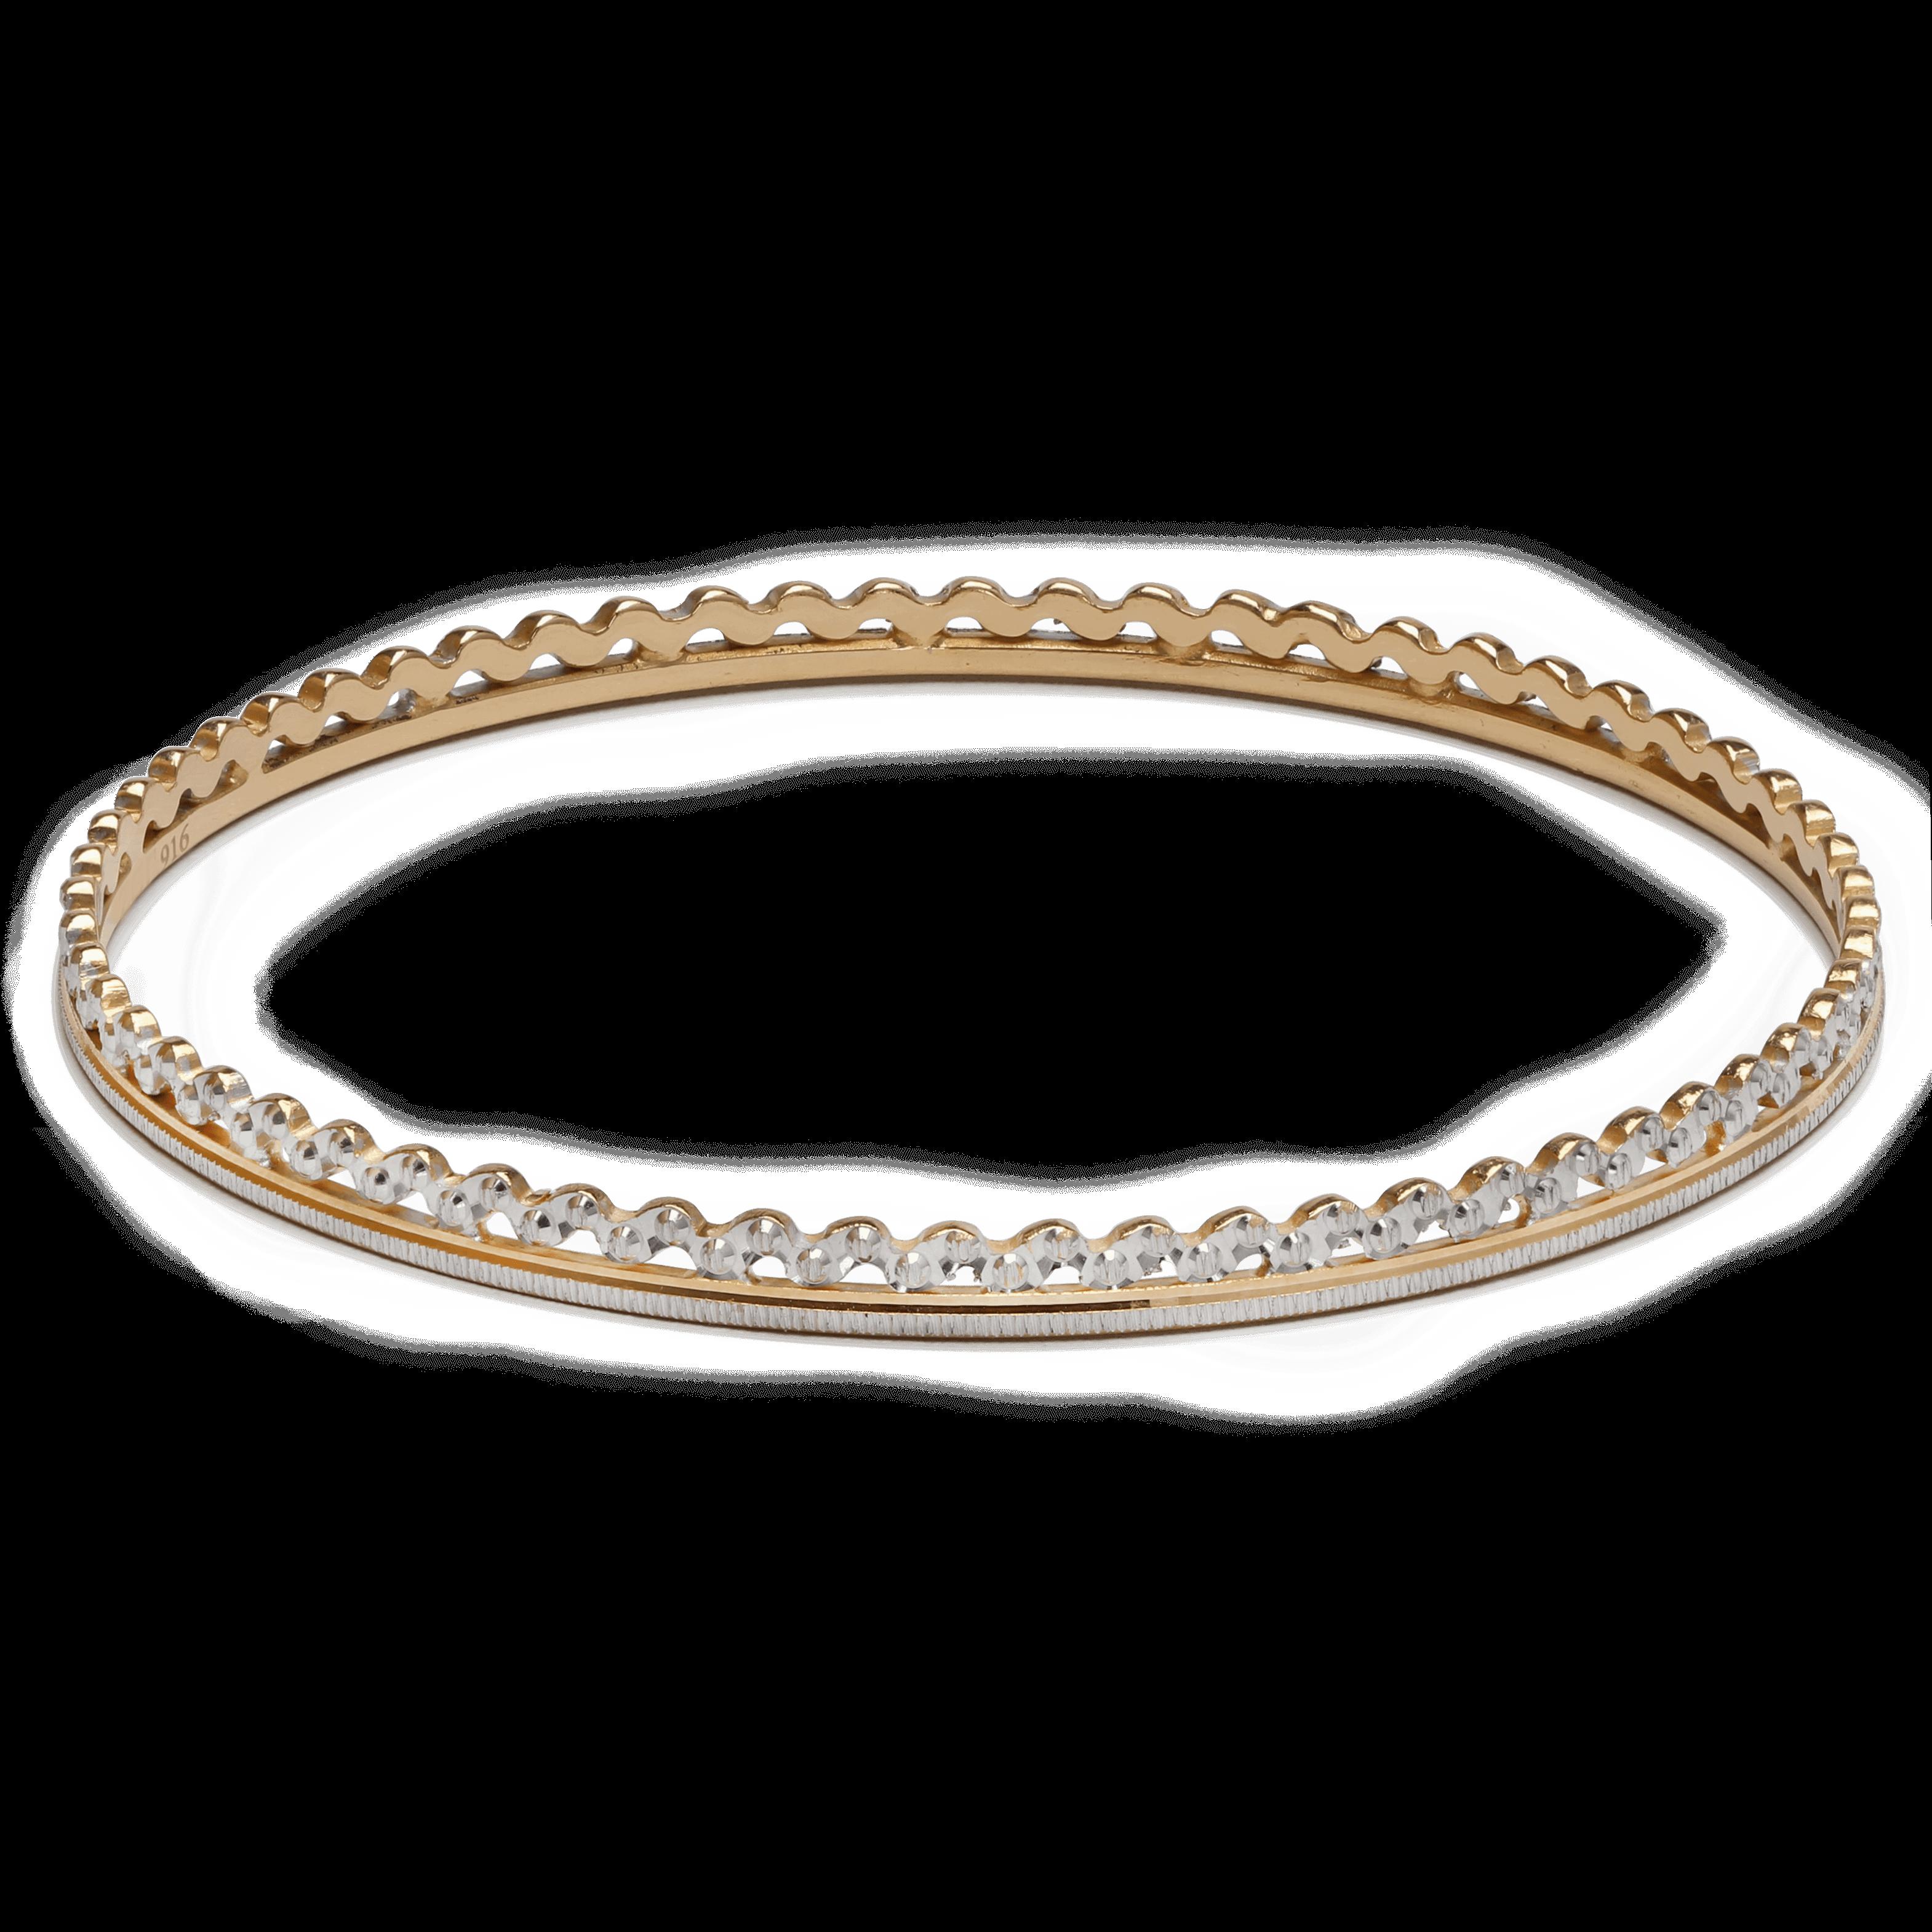 25777 - 22ct Gold Bangle Rhodium Plated